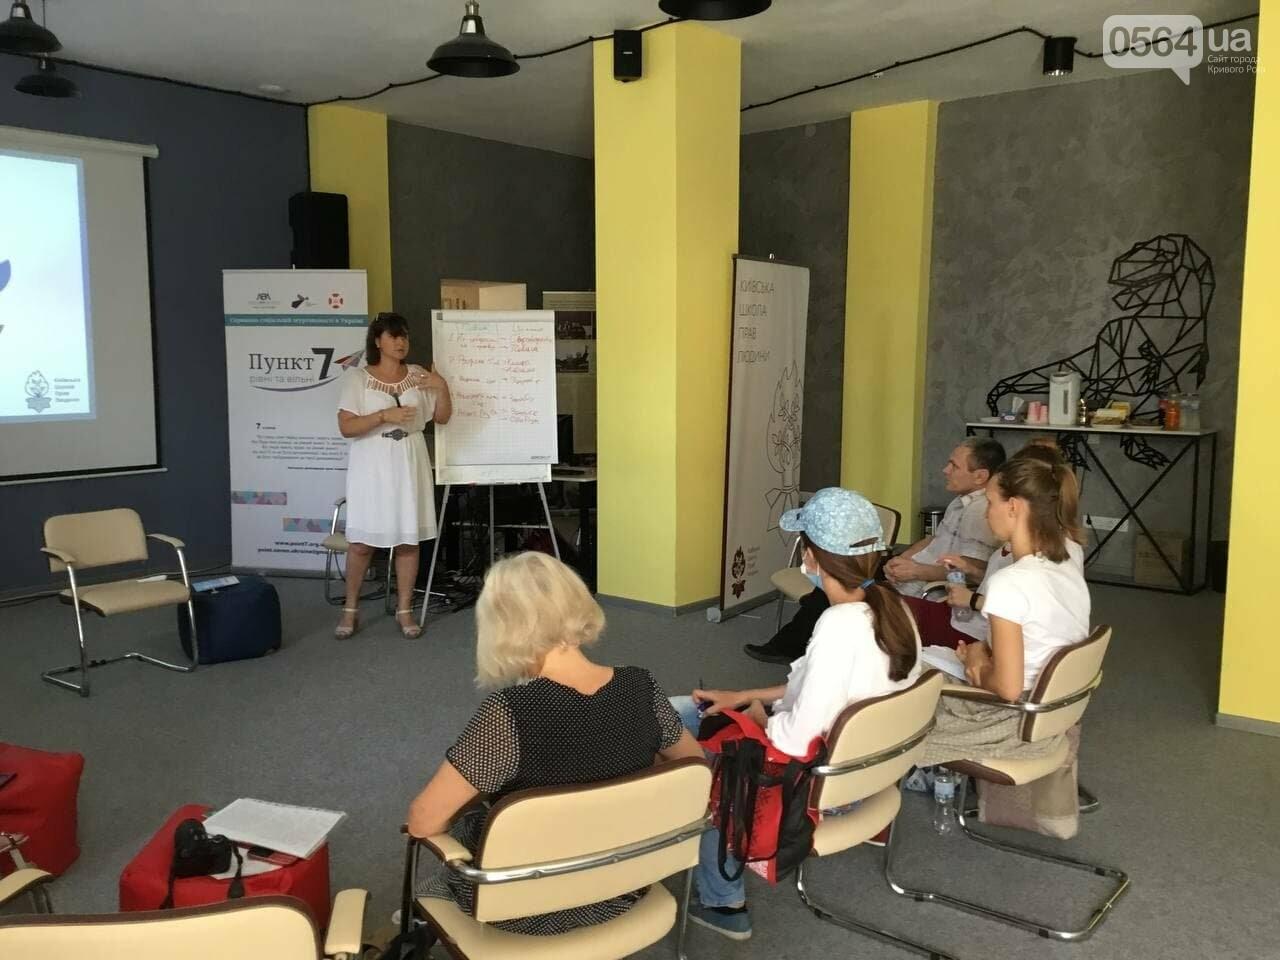 Криворожанам прочитали лекции о гендерном (не) равенстве и правах человека, - ФОТО, ВИДЕО, фото-3